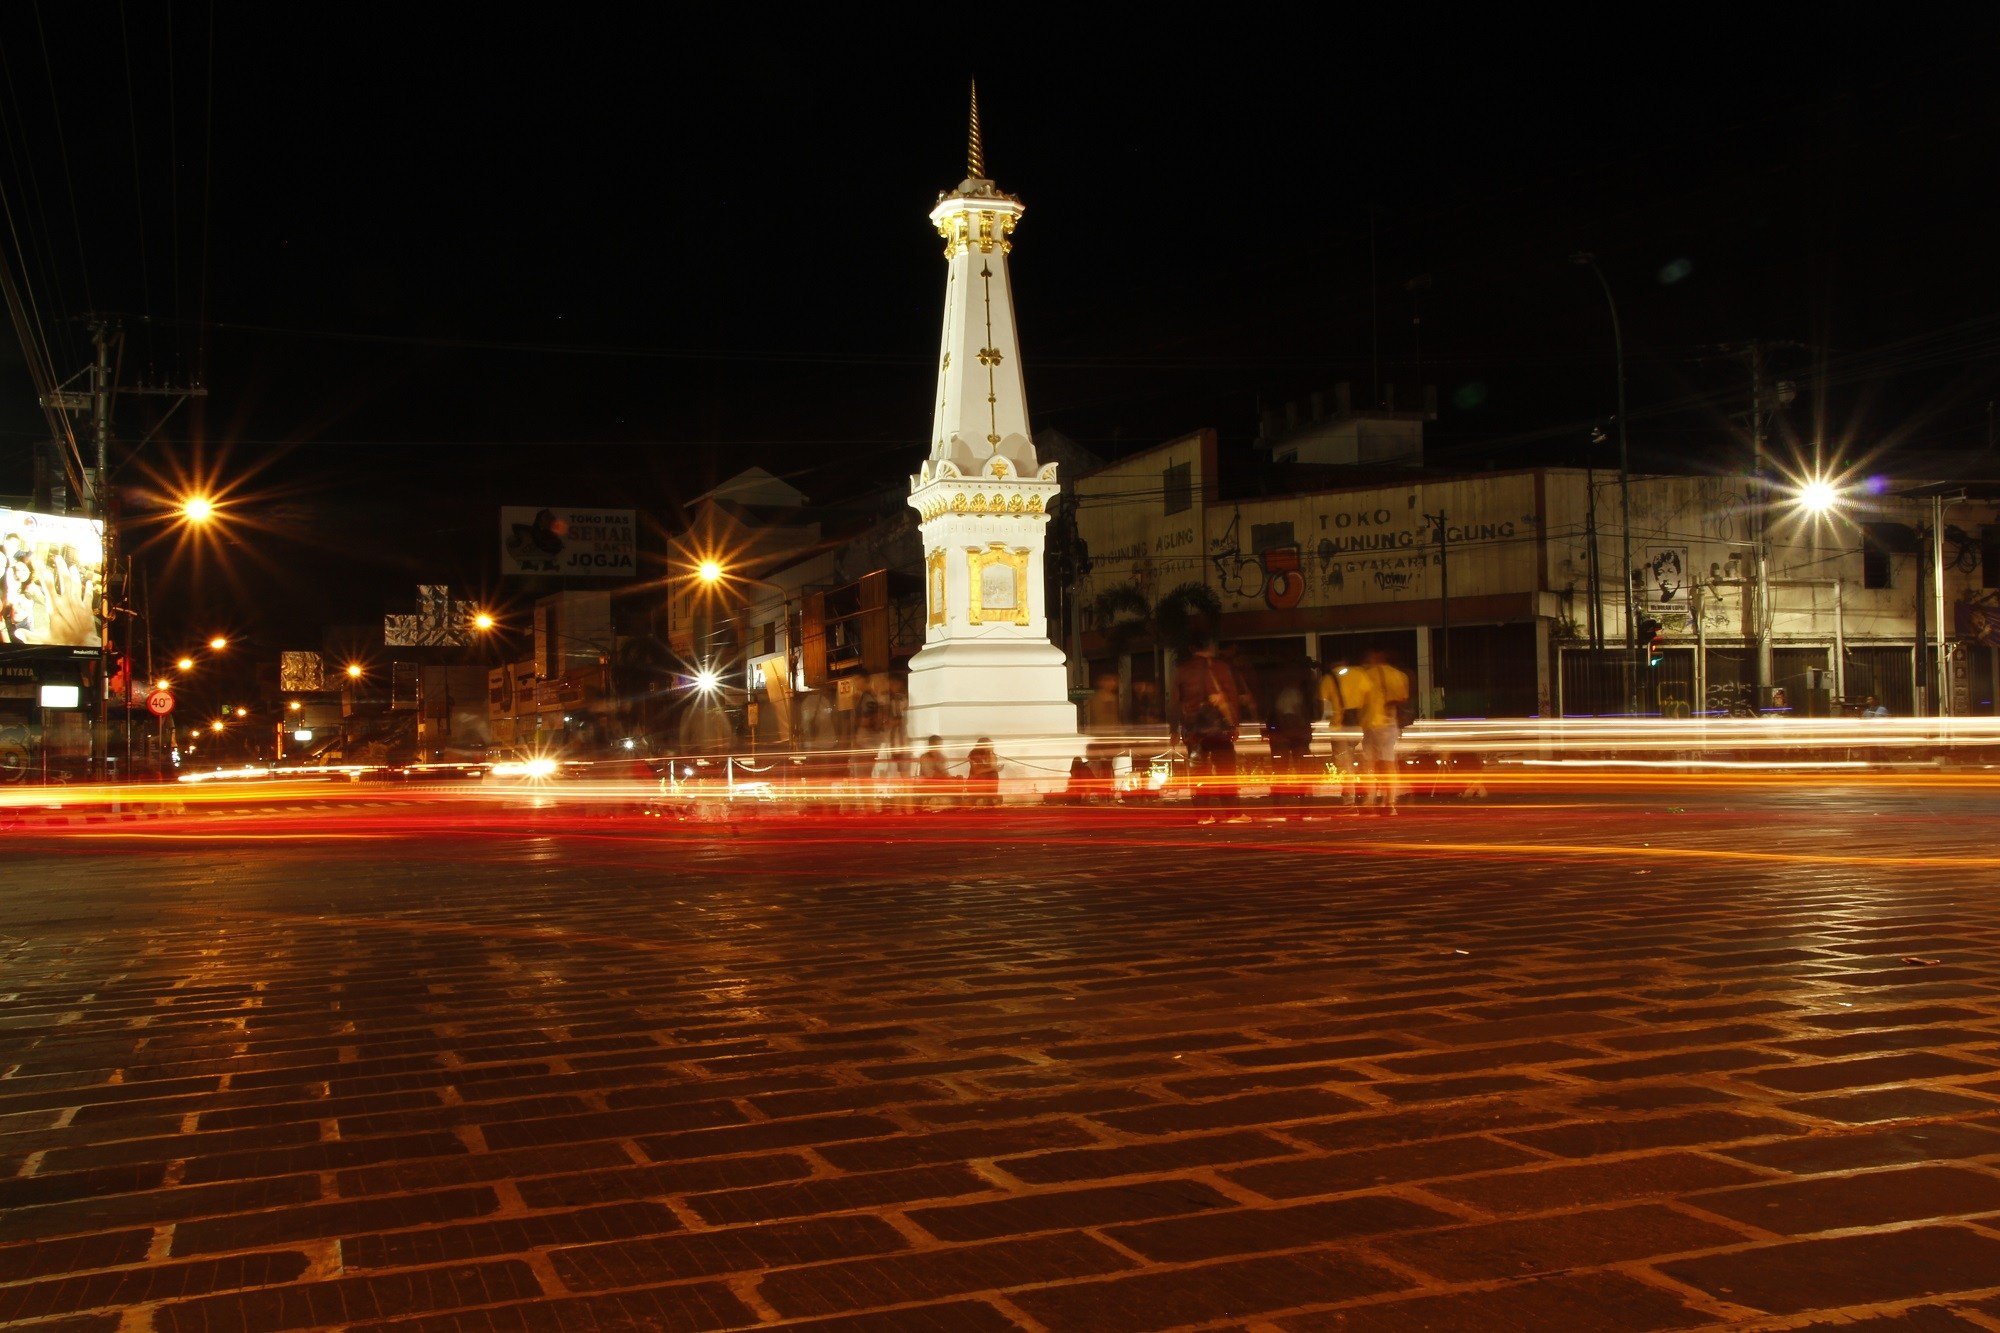 10 Wisata Malam Jogja Yang Hits 038 Anti Mainstream Mamikos Info